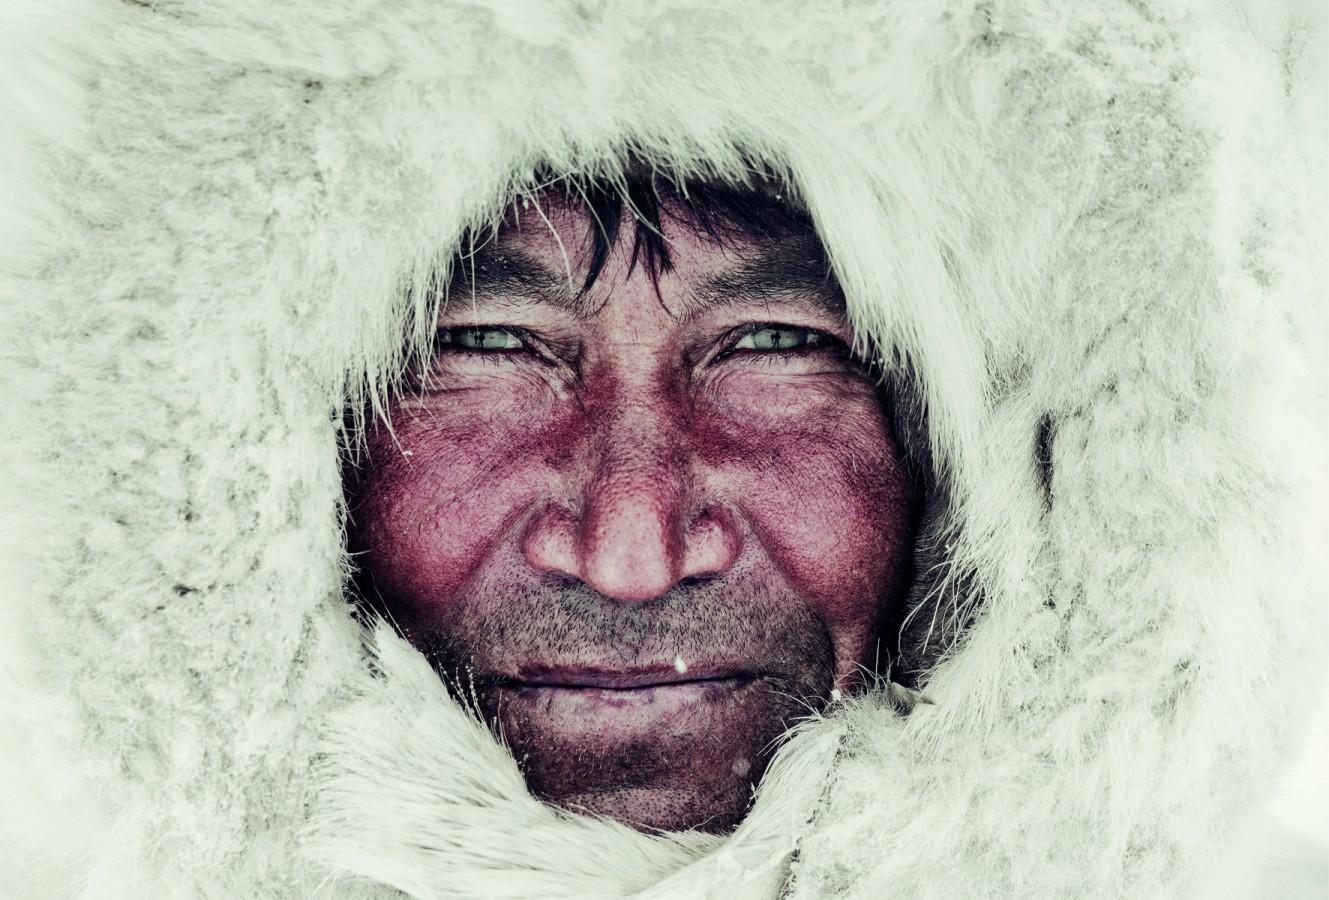 Stunning Photographs Of The World's Last Indigenous Tribes - YAKIM, BRIGADE